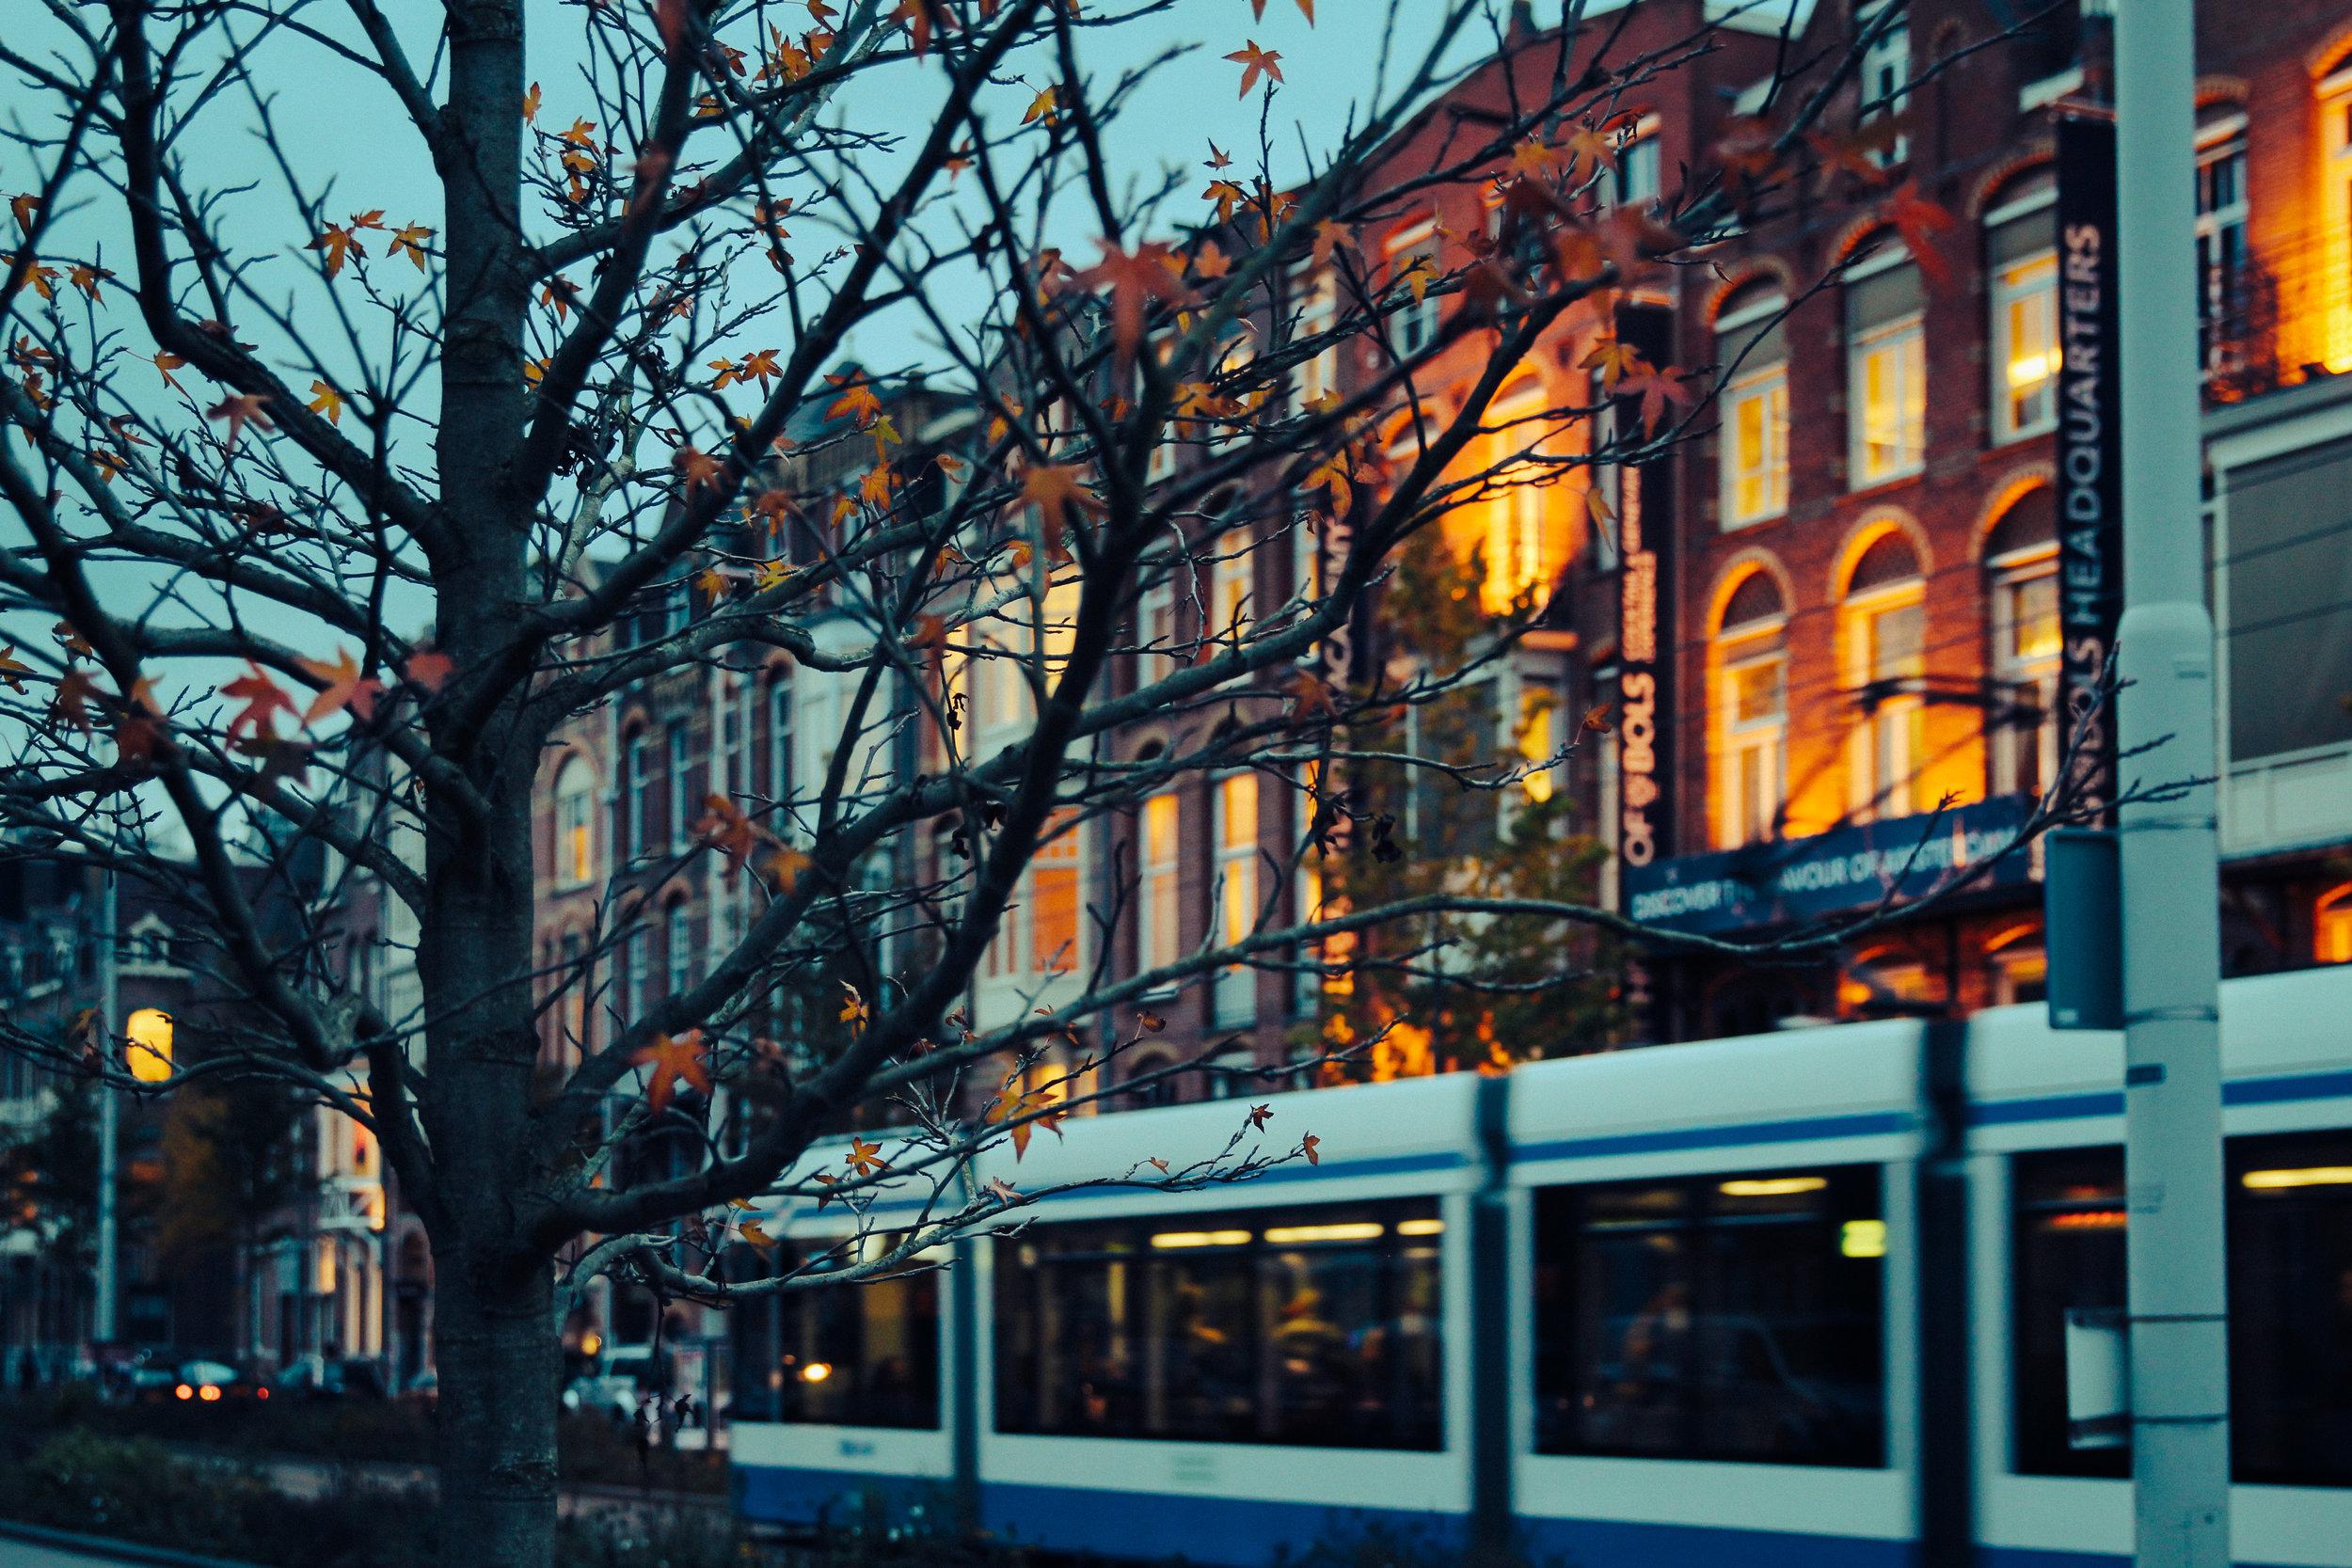 amsterdam travel guide let s go bravo